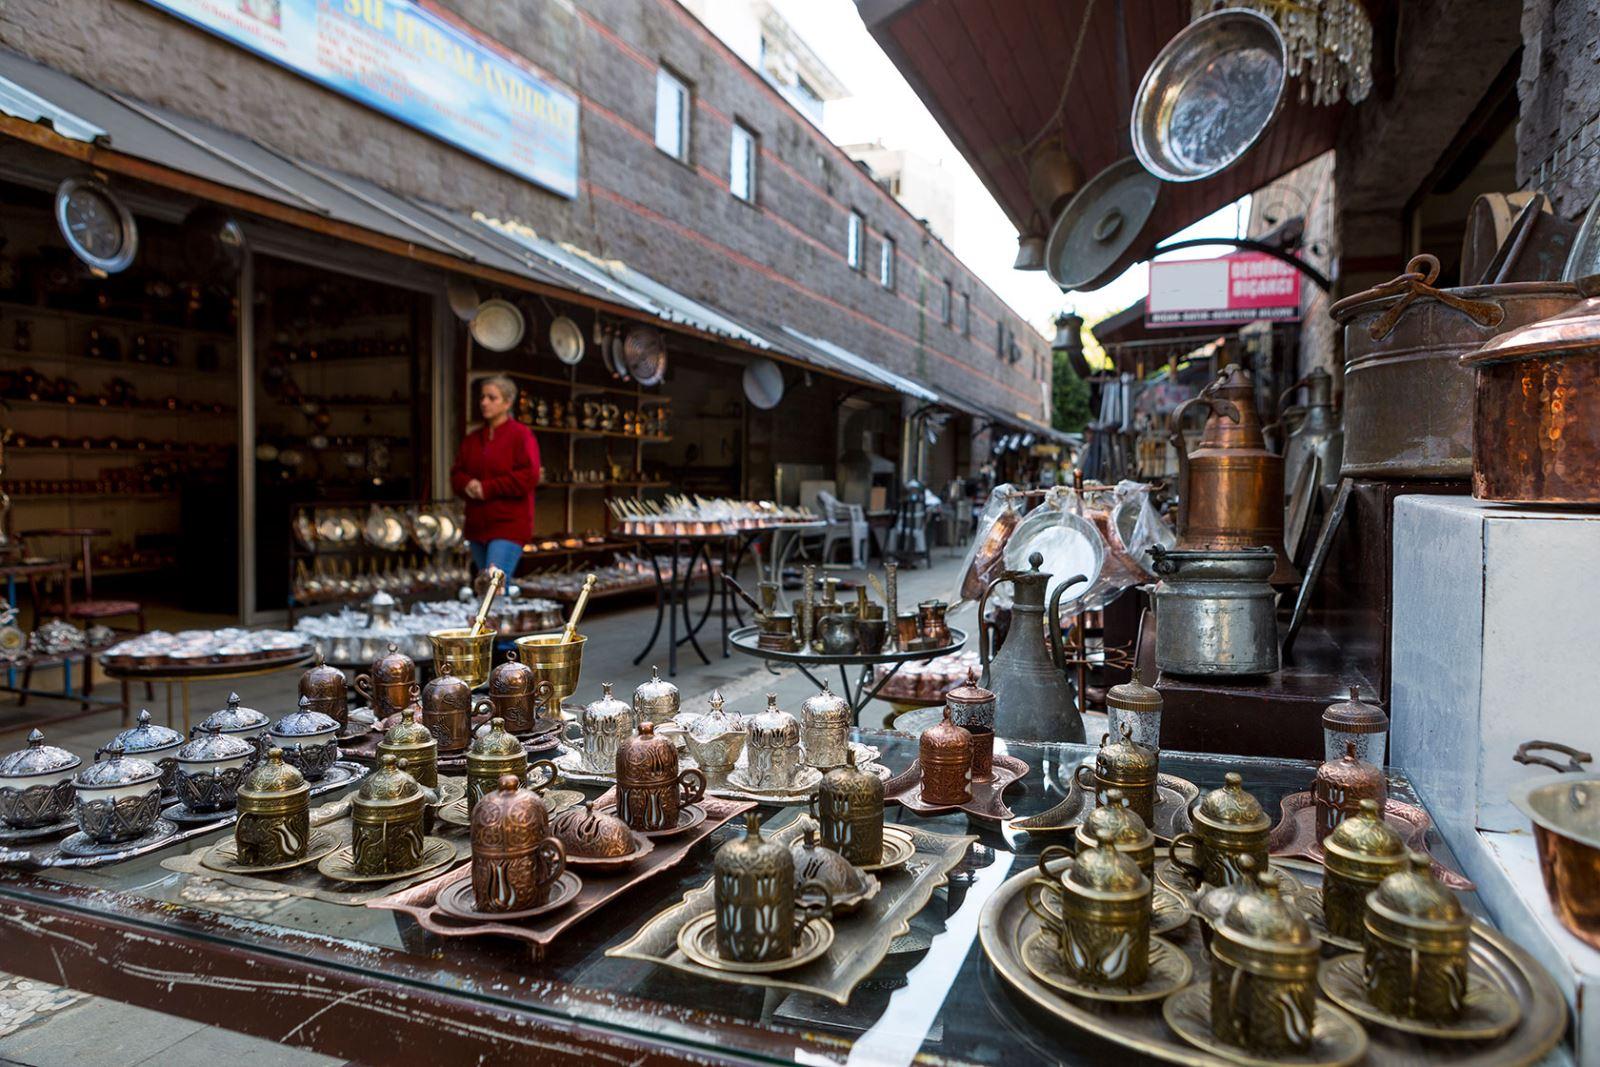 Antalya el sanatları